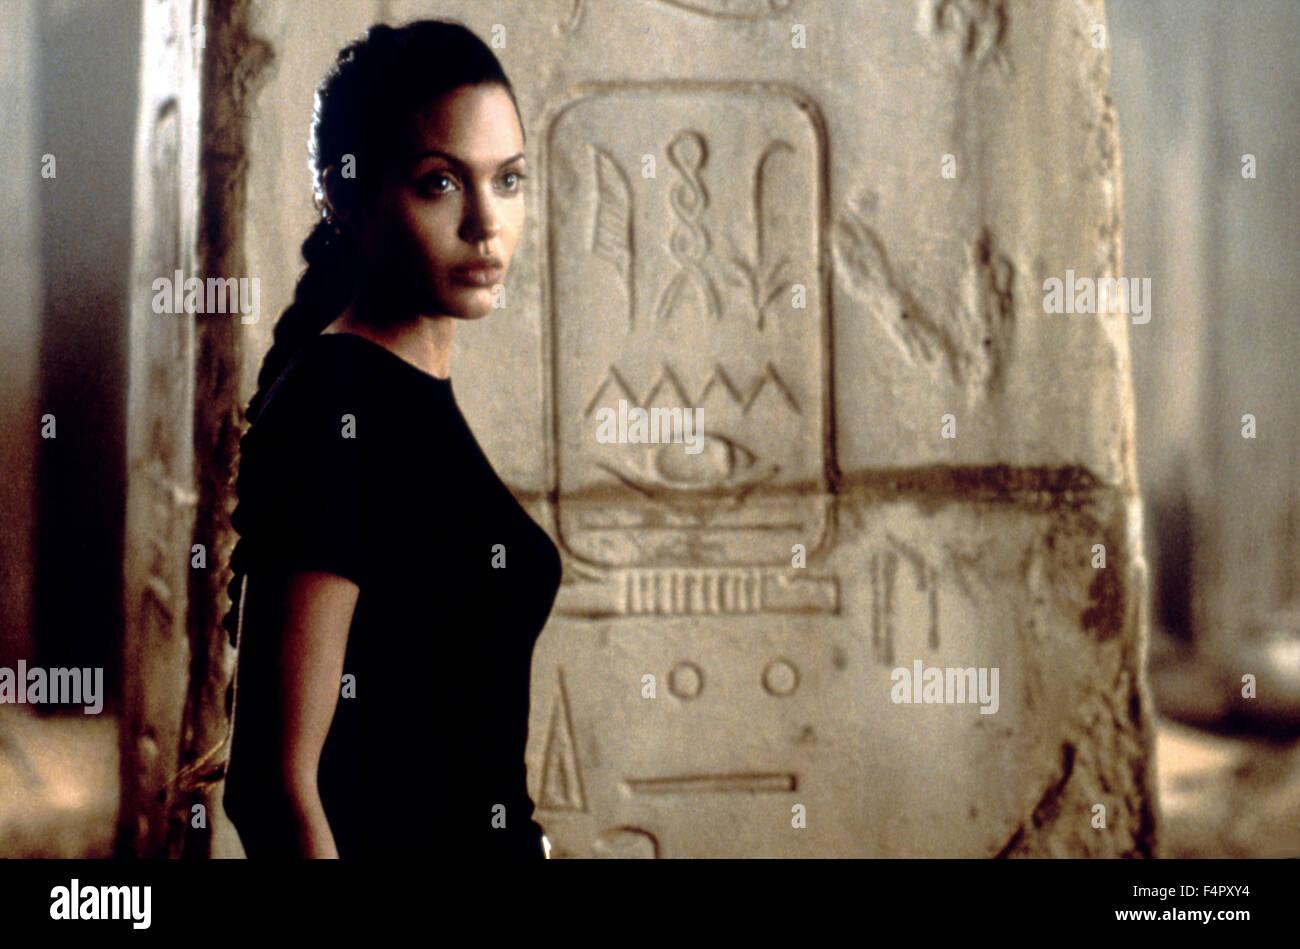 Angelina Jolie ,Lara Croft: Tomb Raider, directed by  Simon West   (2001) - Stock Image